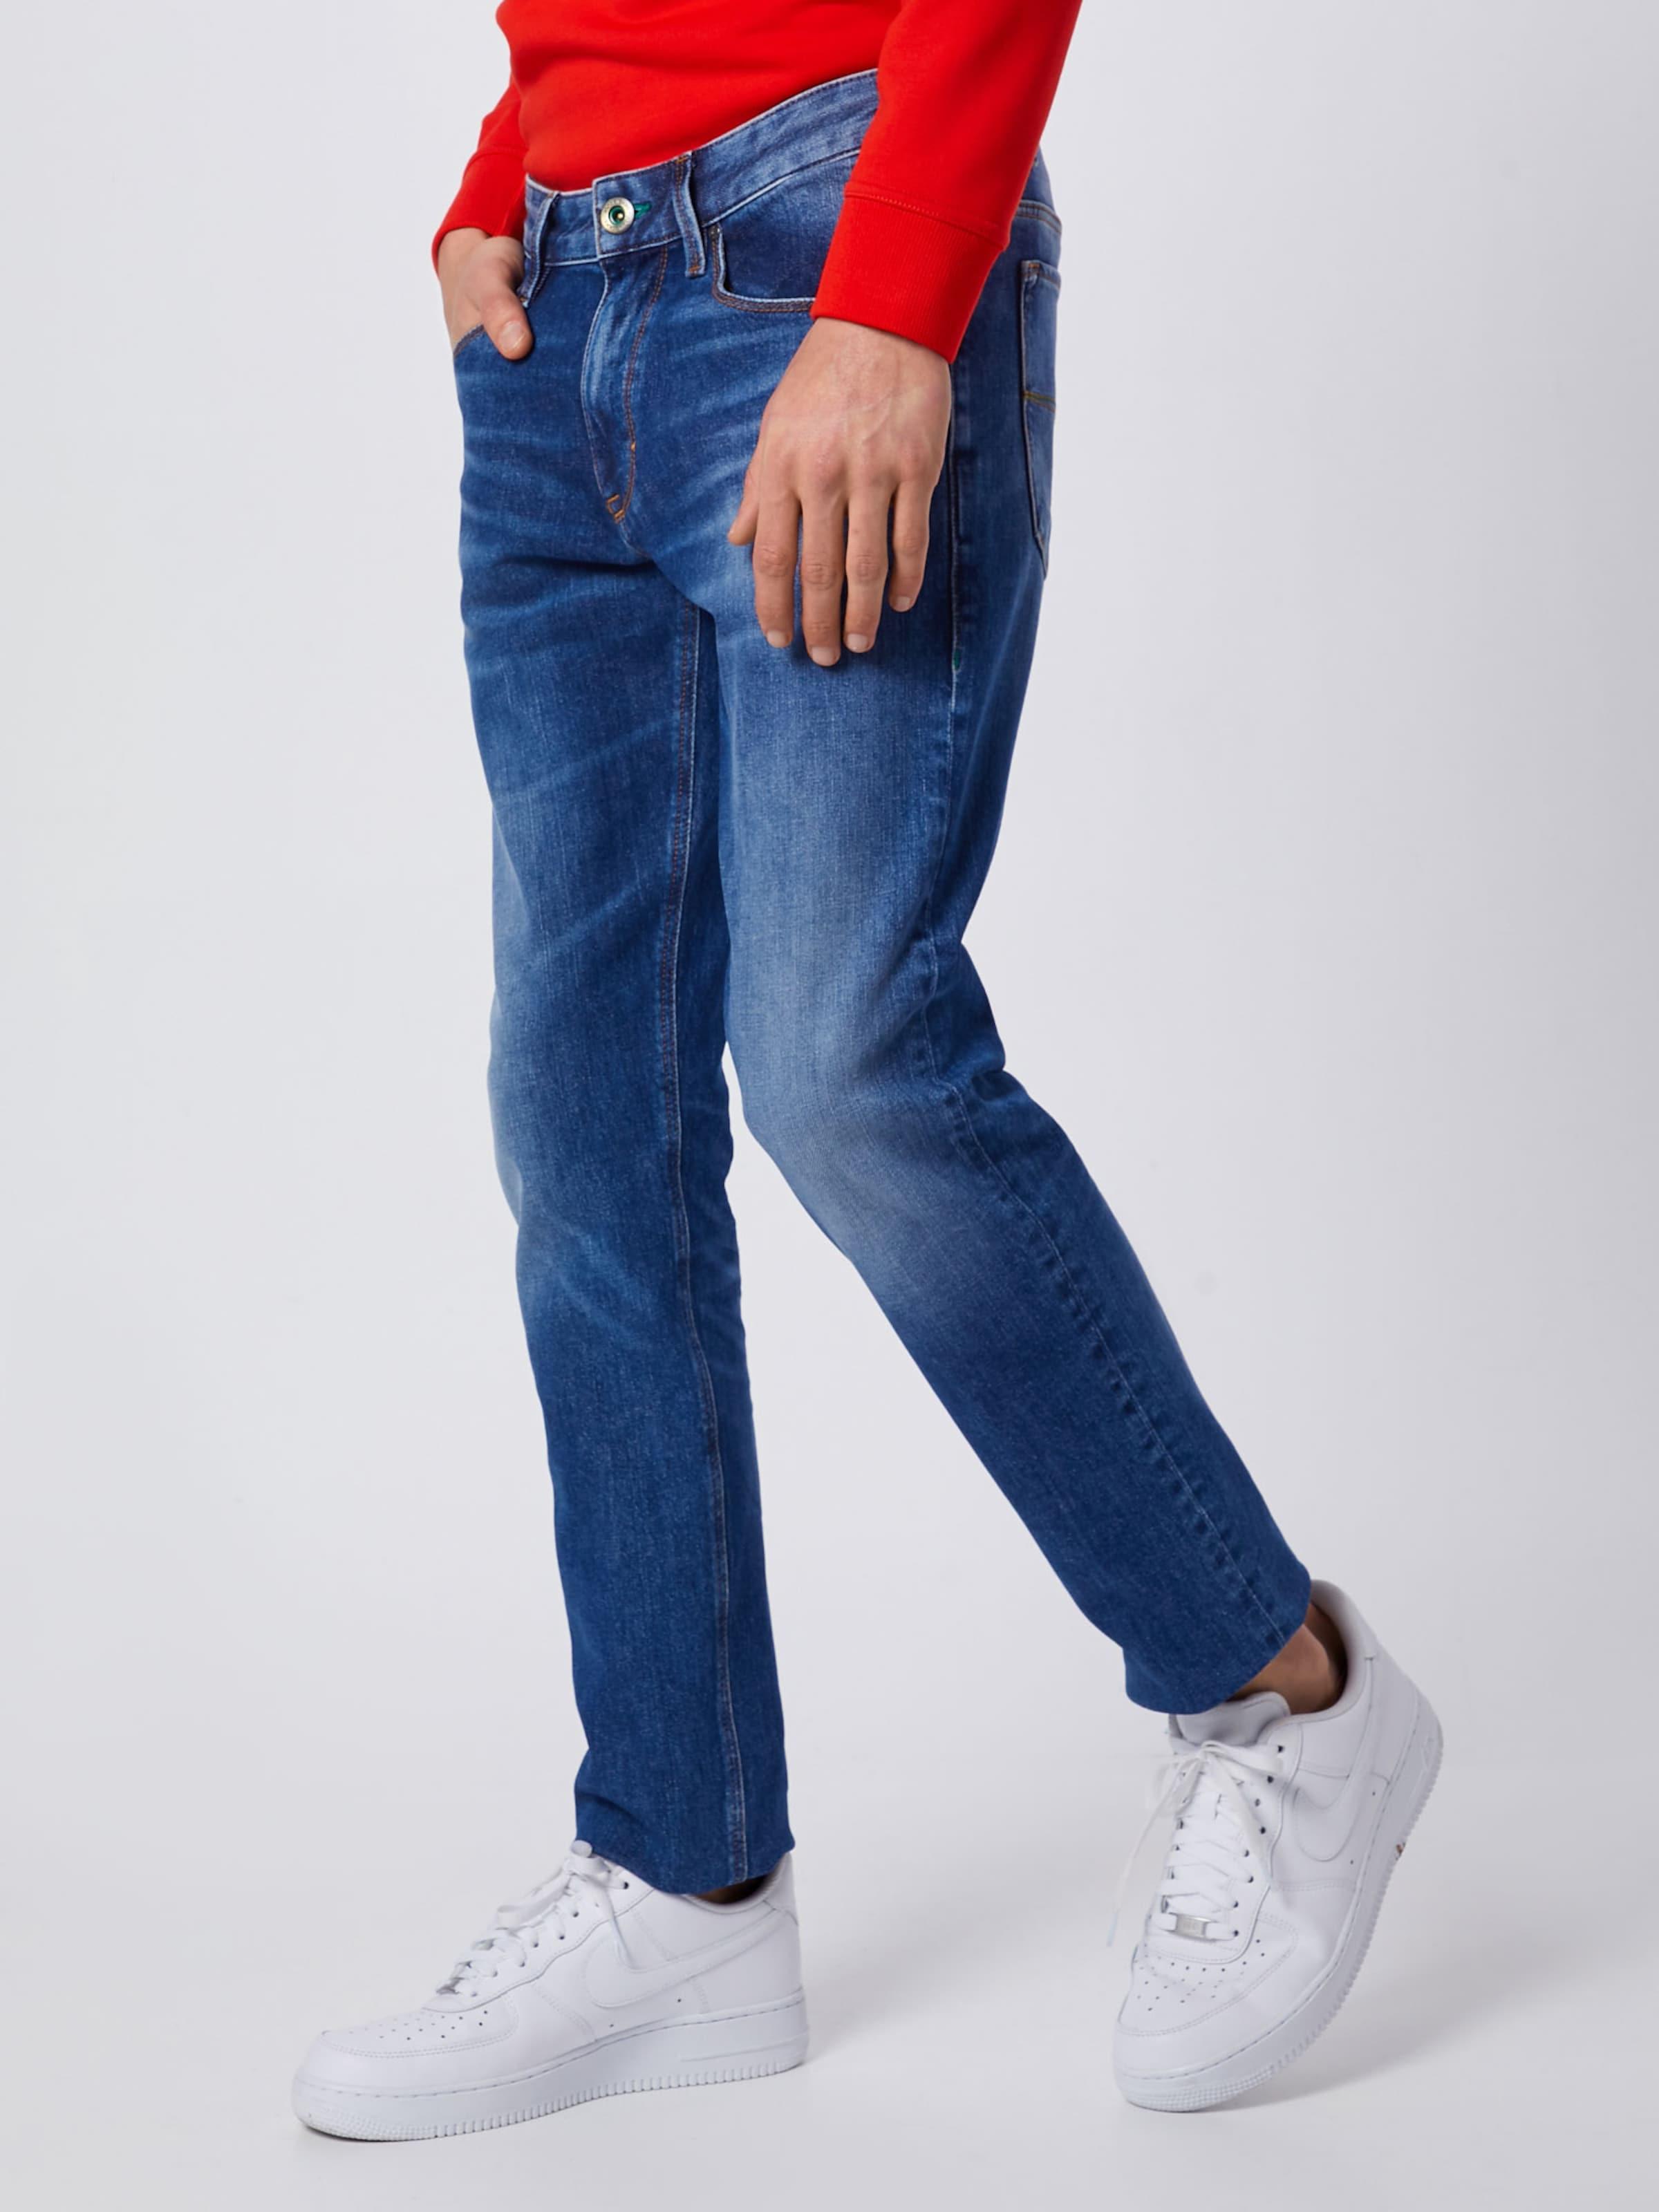 02' Blue '15 10006991 JoopJeans Jjd 03stephen In Denim 5Rj3L4A